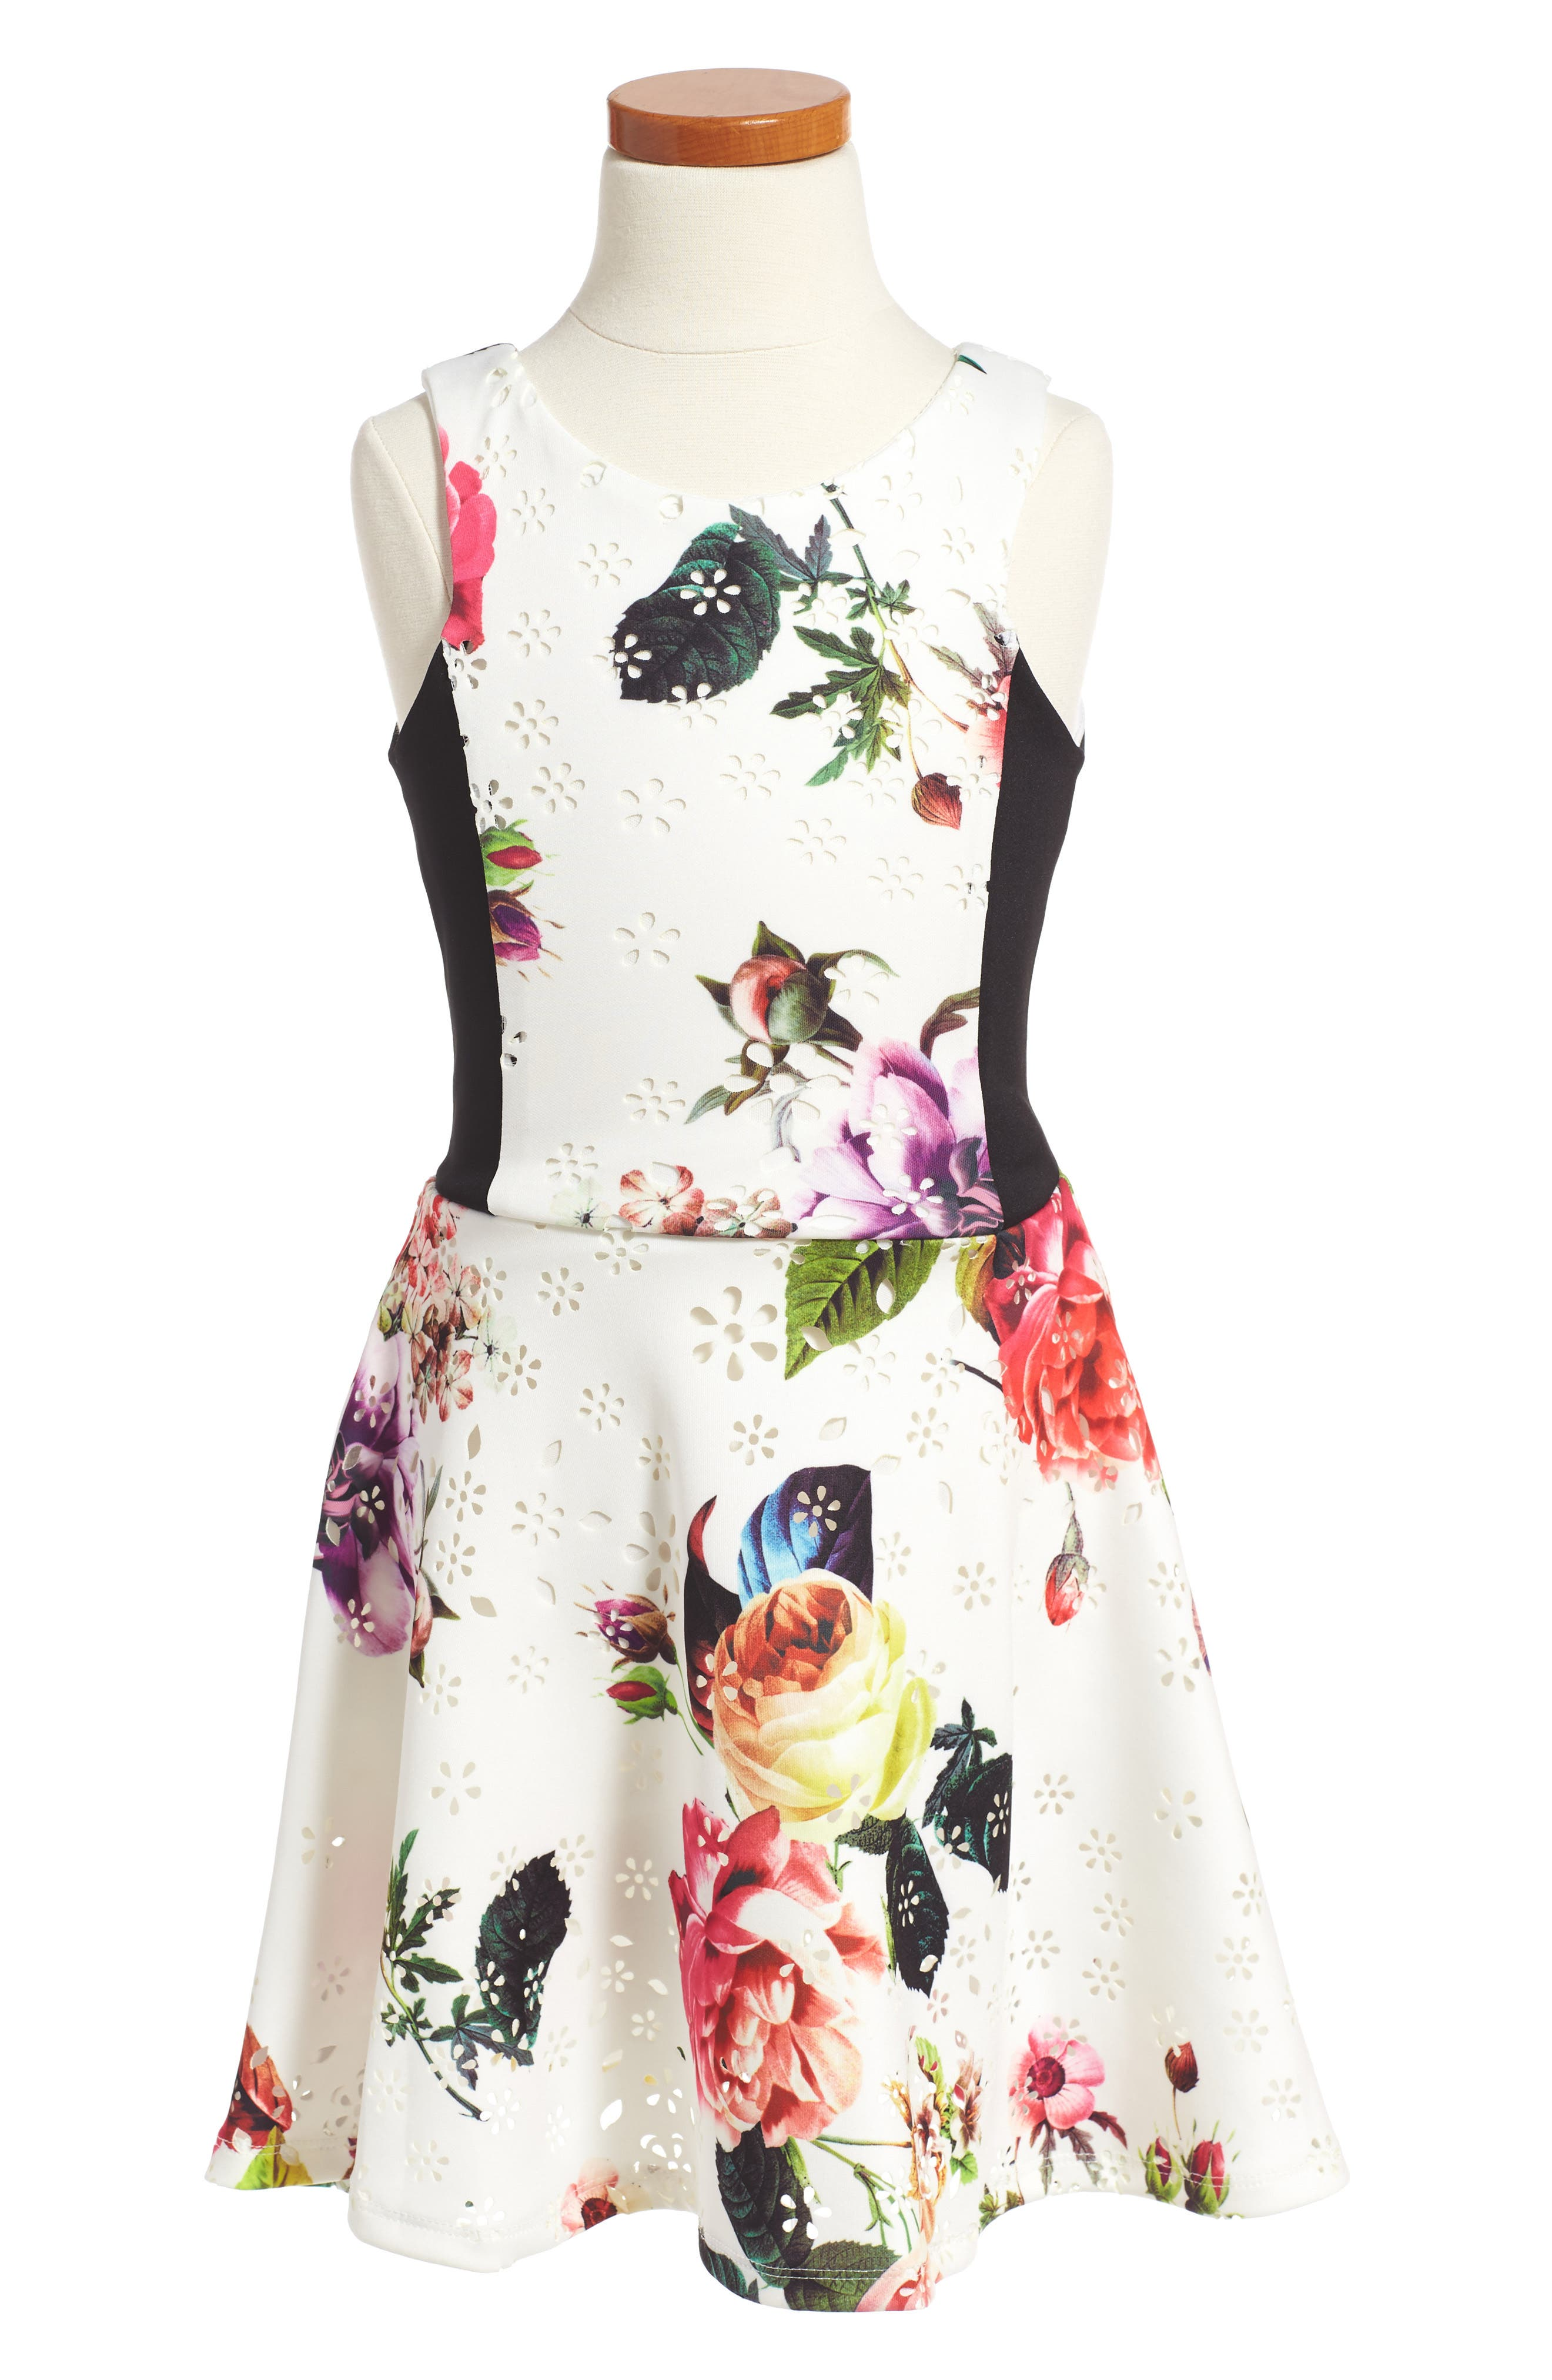 Floral Print Sleeveless Dress,                             Main thumbnail 1, color,                             900